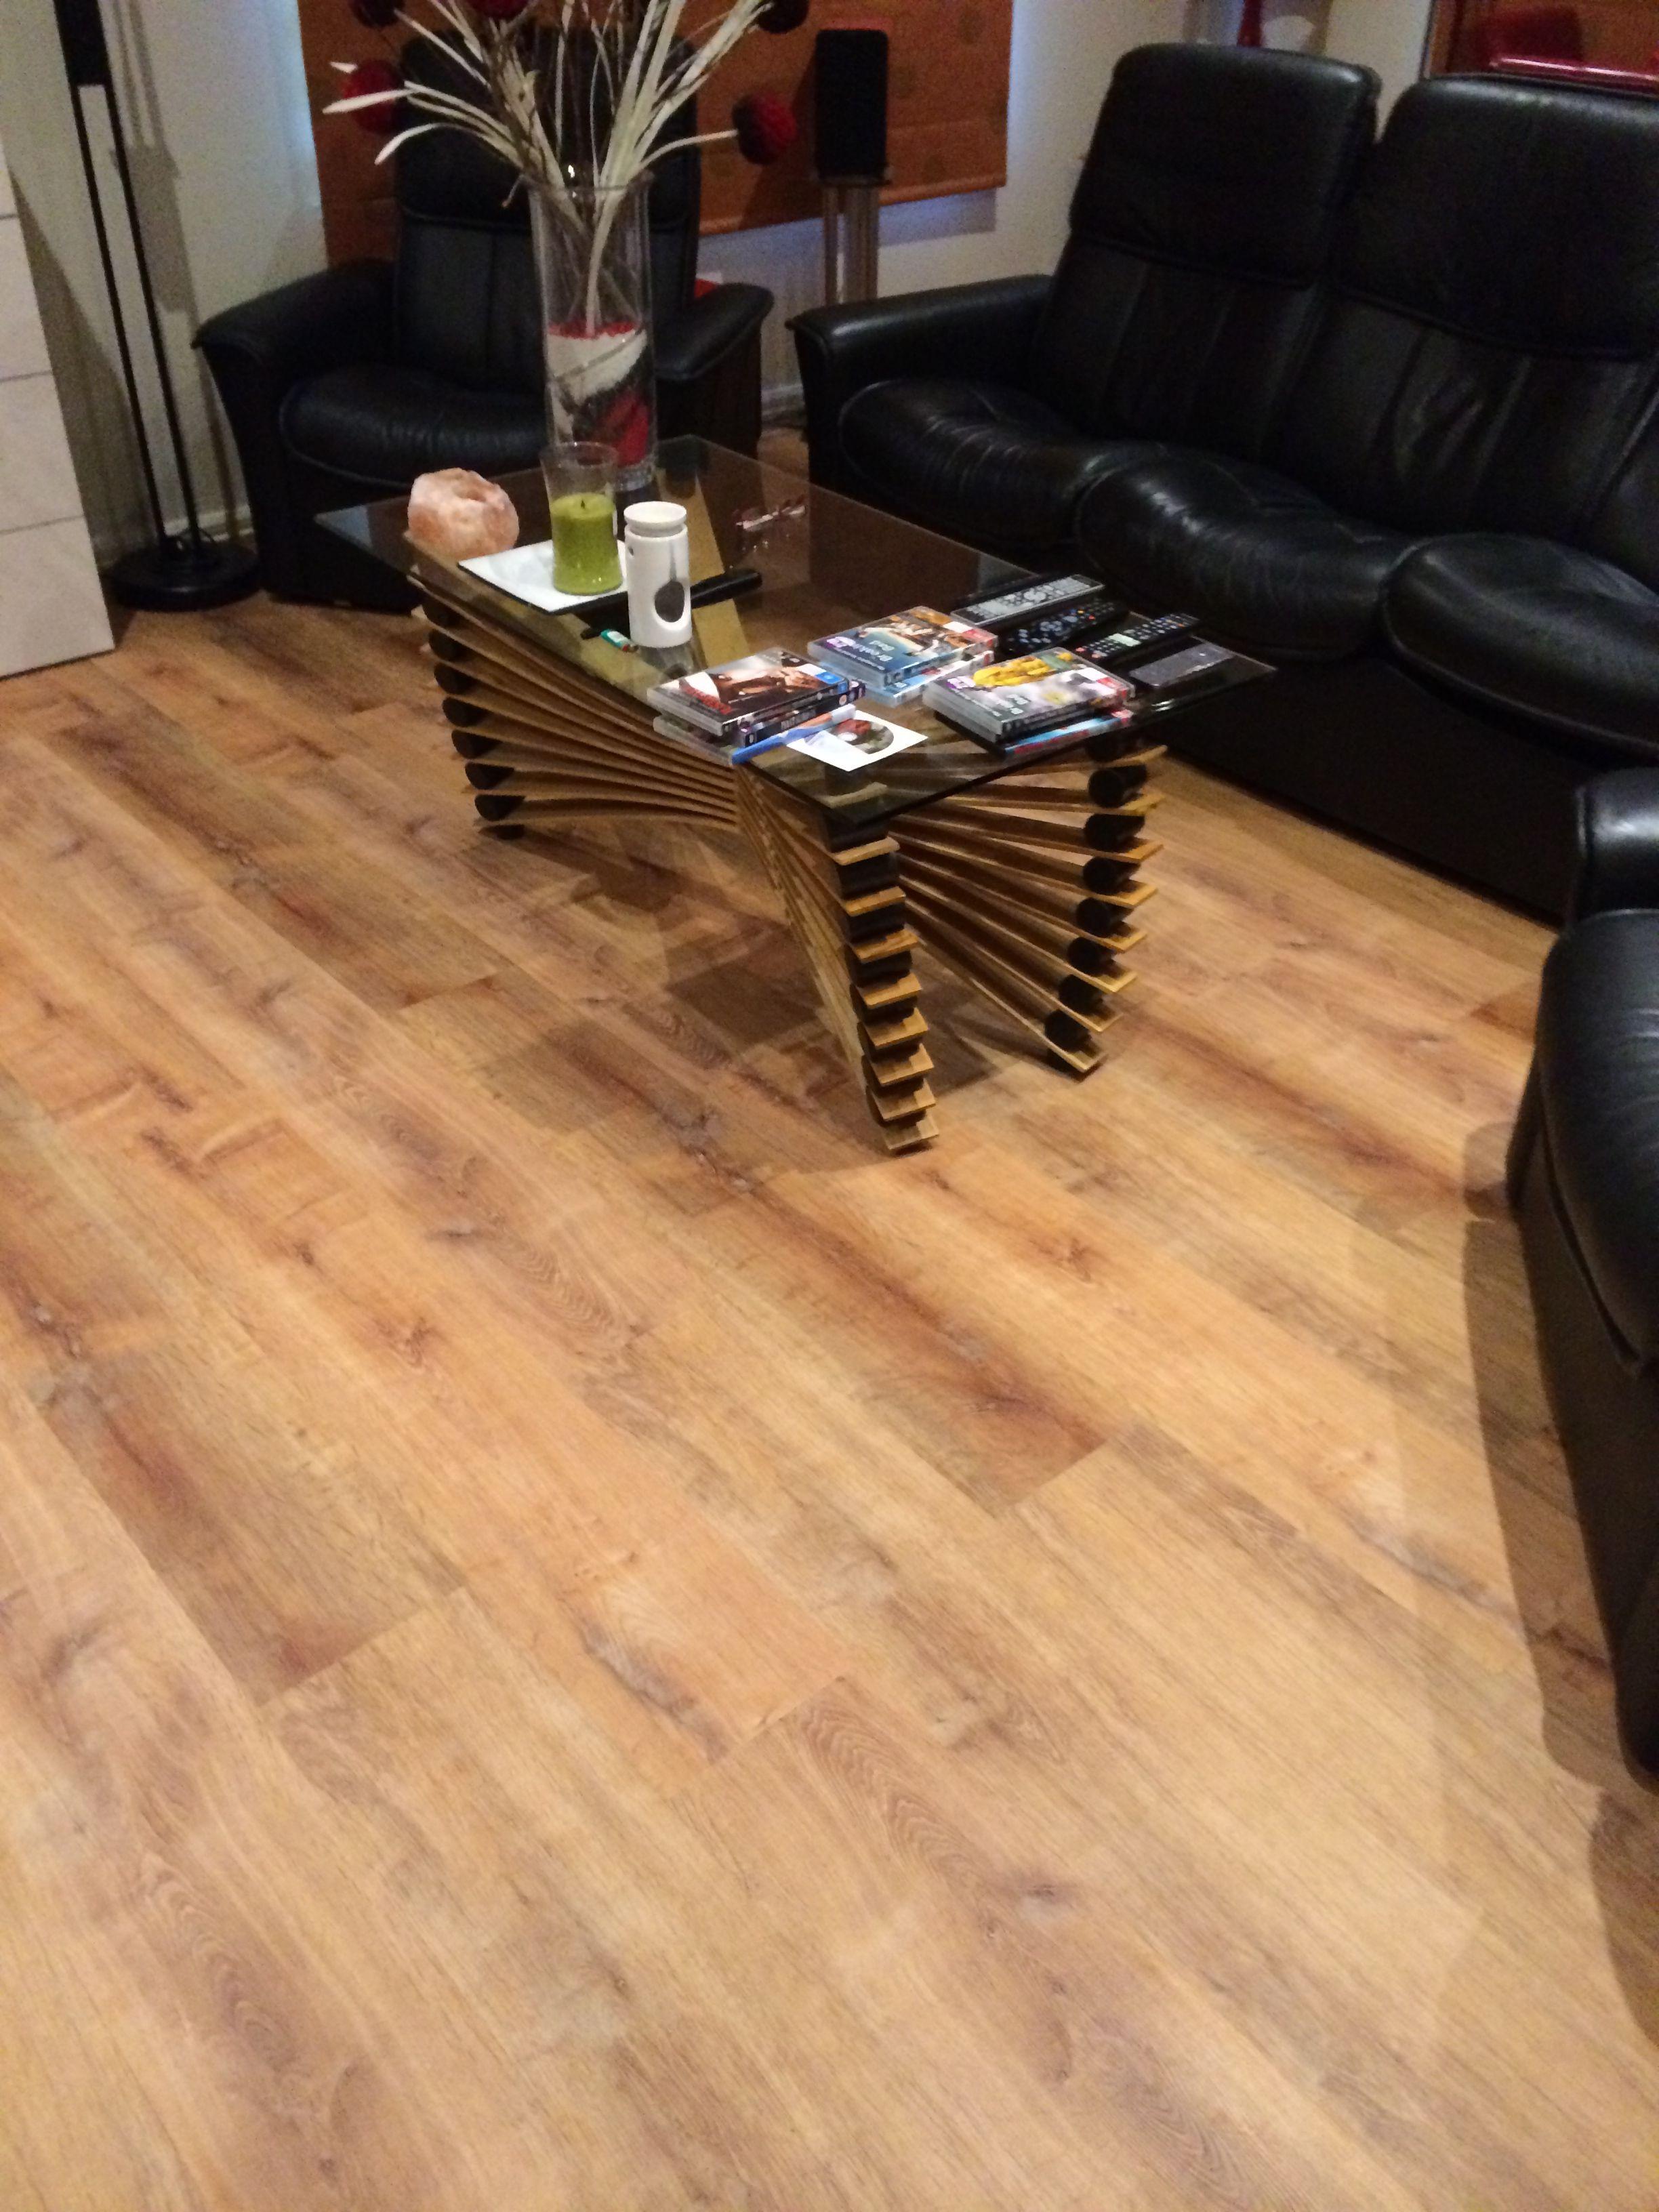 Allure Locking 220 Gen 3 Vinyl Plank Flooring Golden Oak Natural Wide Plank Flooring Wood Floors Wide Plank Vinyl Plank Flooring